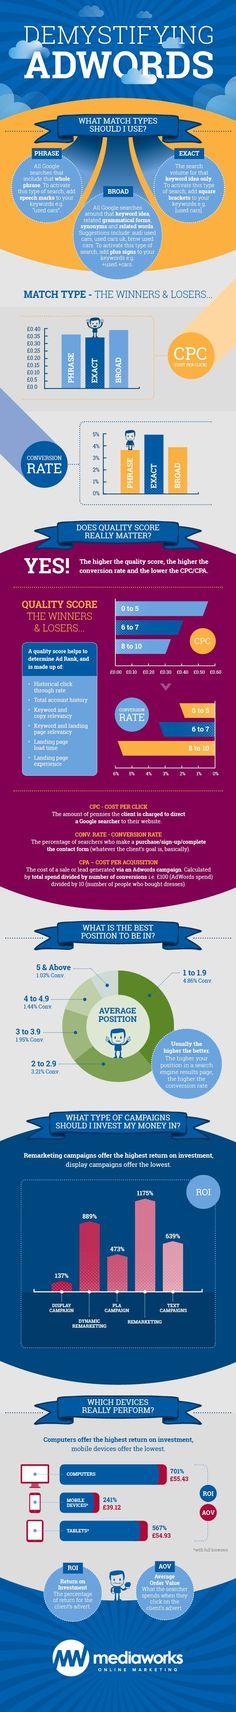 Google Adwords explained. For more social media marketing visit www.socialmediabusinessacademy.com Adwords Infographic